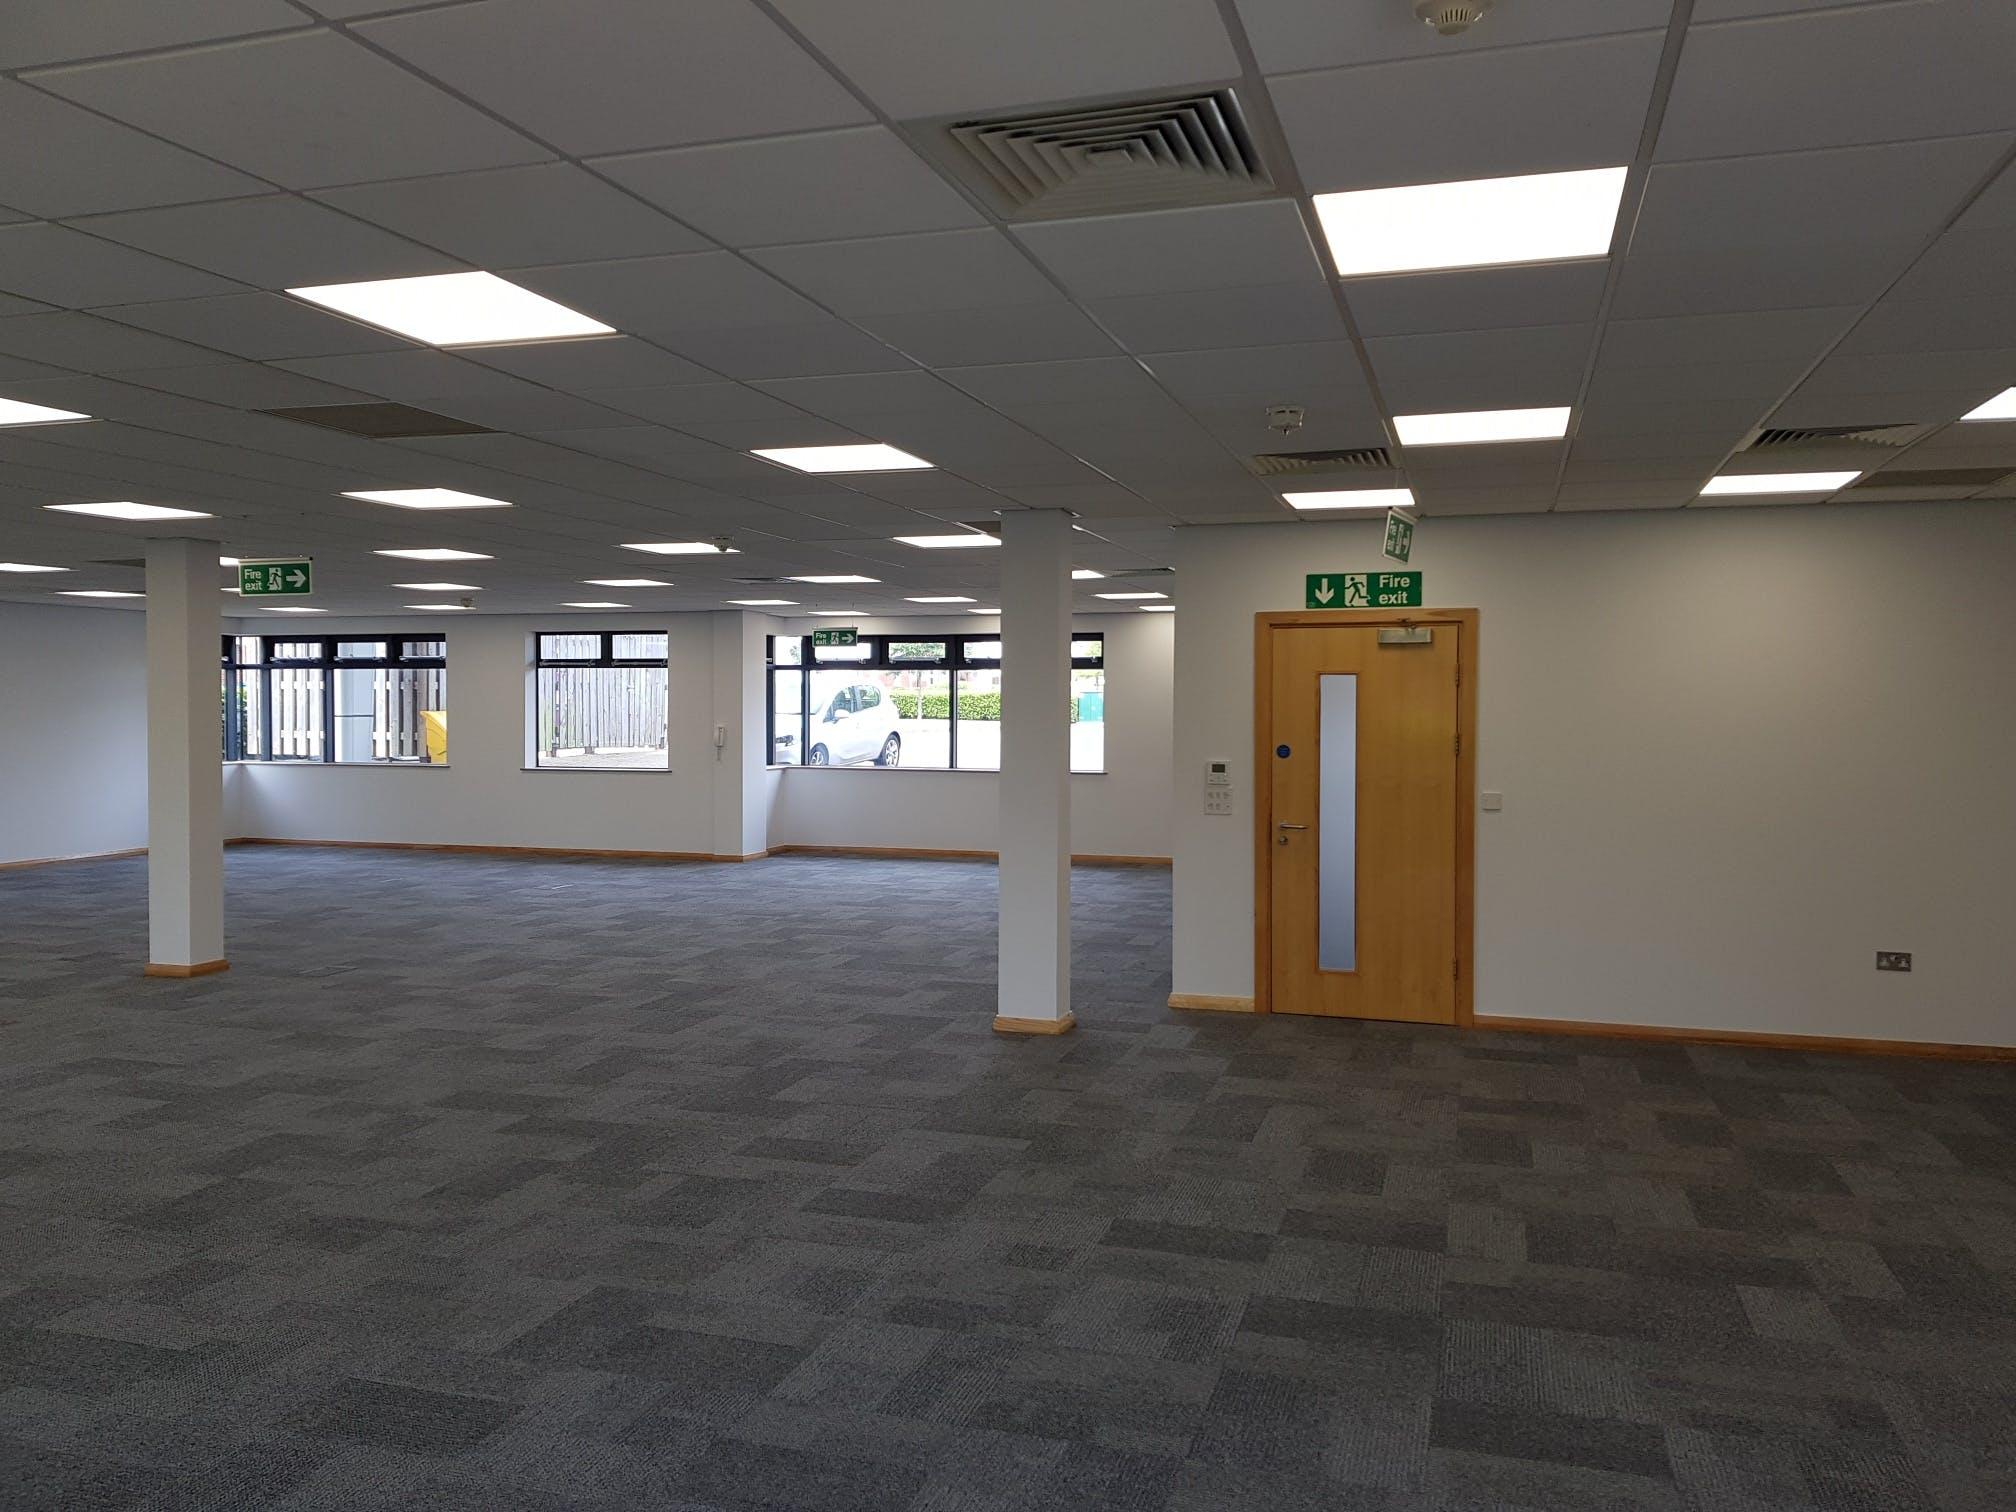 Unit 13 Conqueror Court, Staplehurst Road, Sittingbourne, Office To Let / For Sale - 20200723_110119_resized.jpg